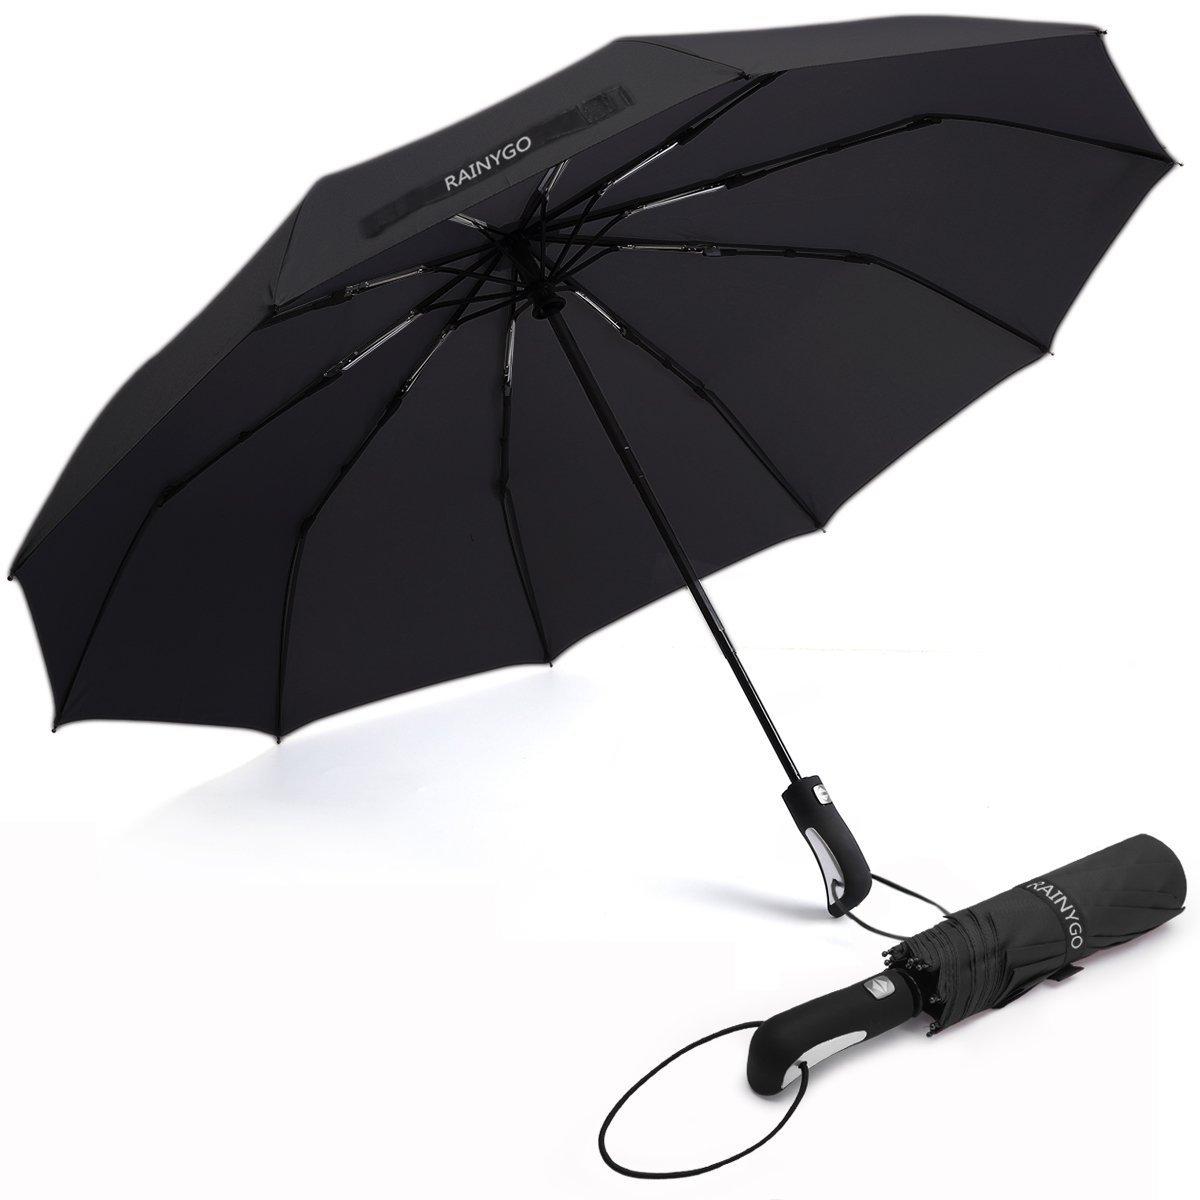 RAINYGO Umbrellas Travel Folding Automatic Umbrella Strong Windproof Compact 210T 10 Ribs Light Weight Auto Open Close